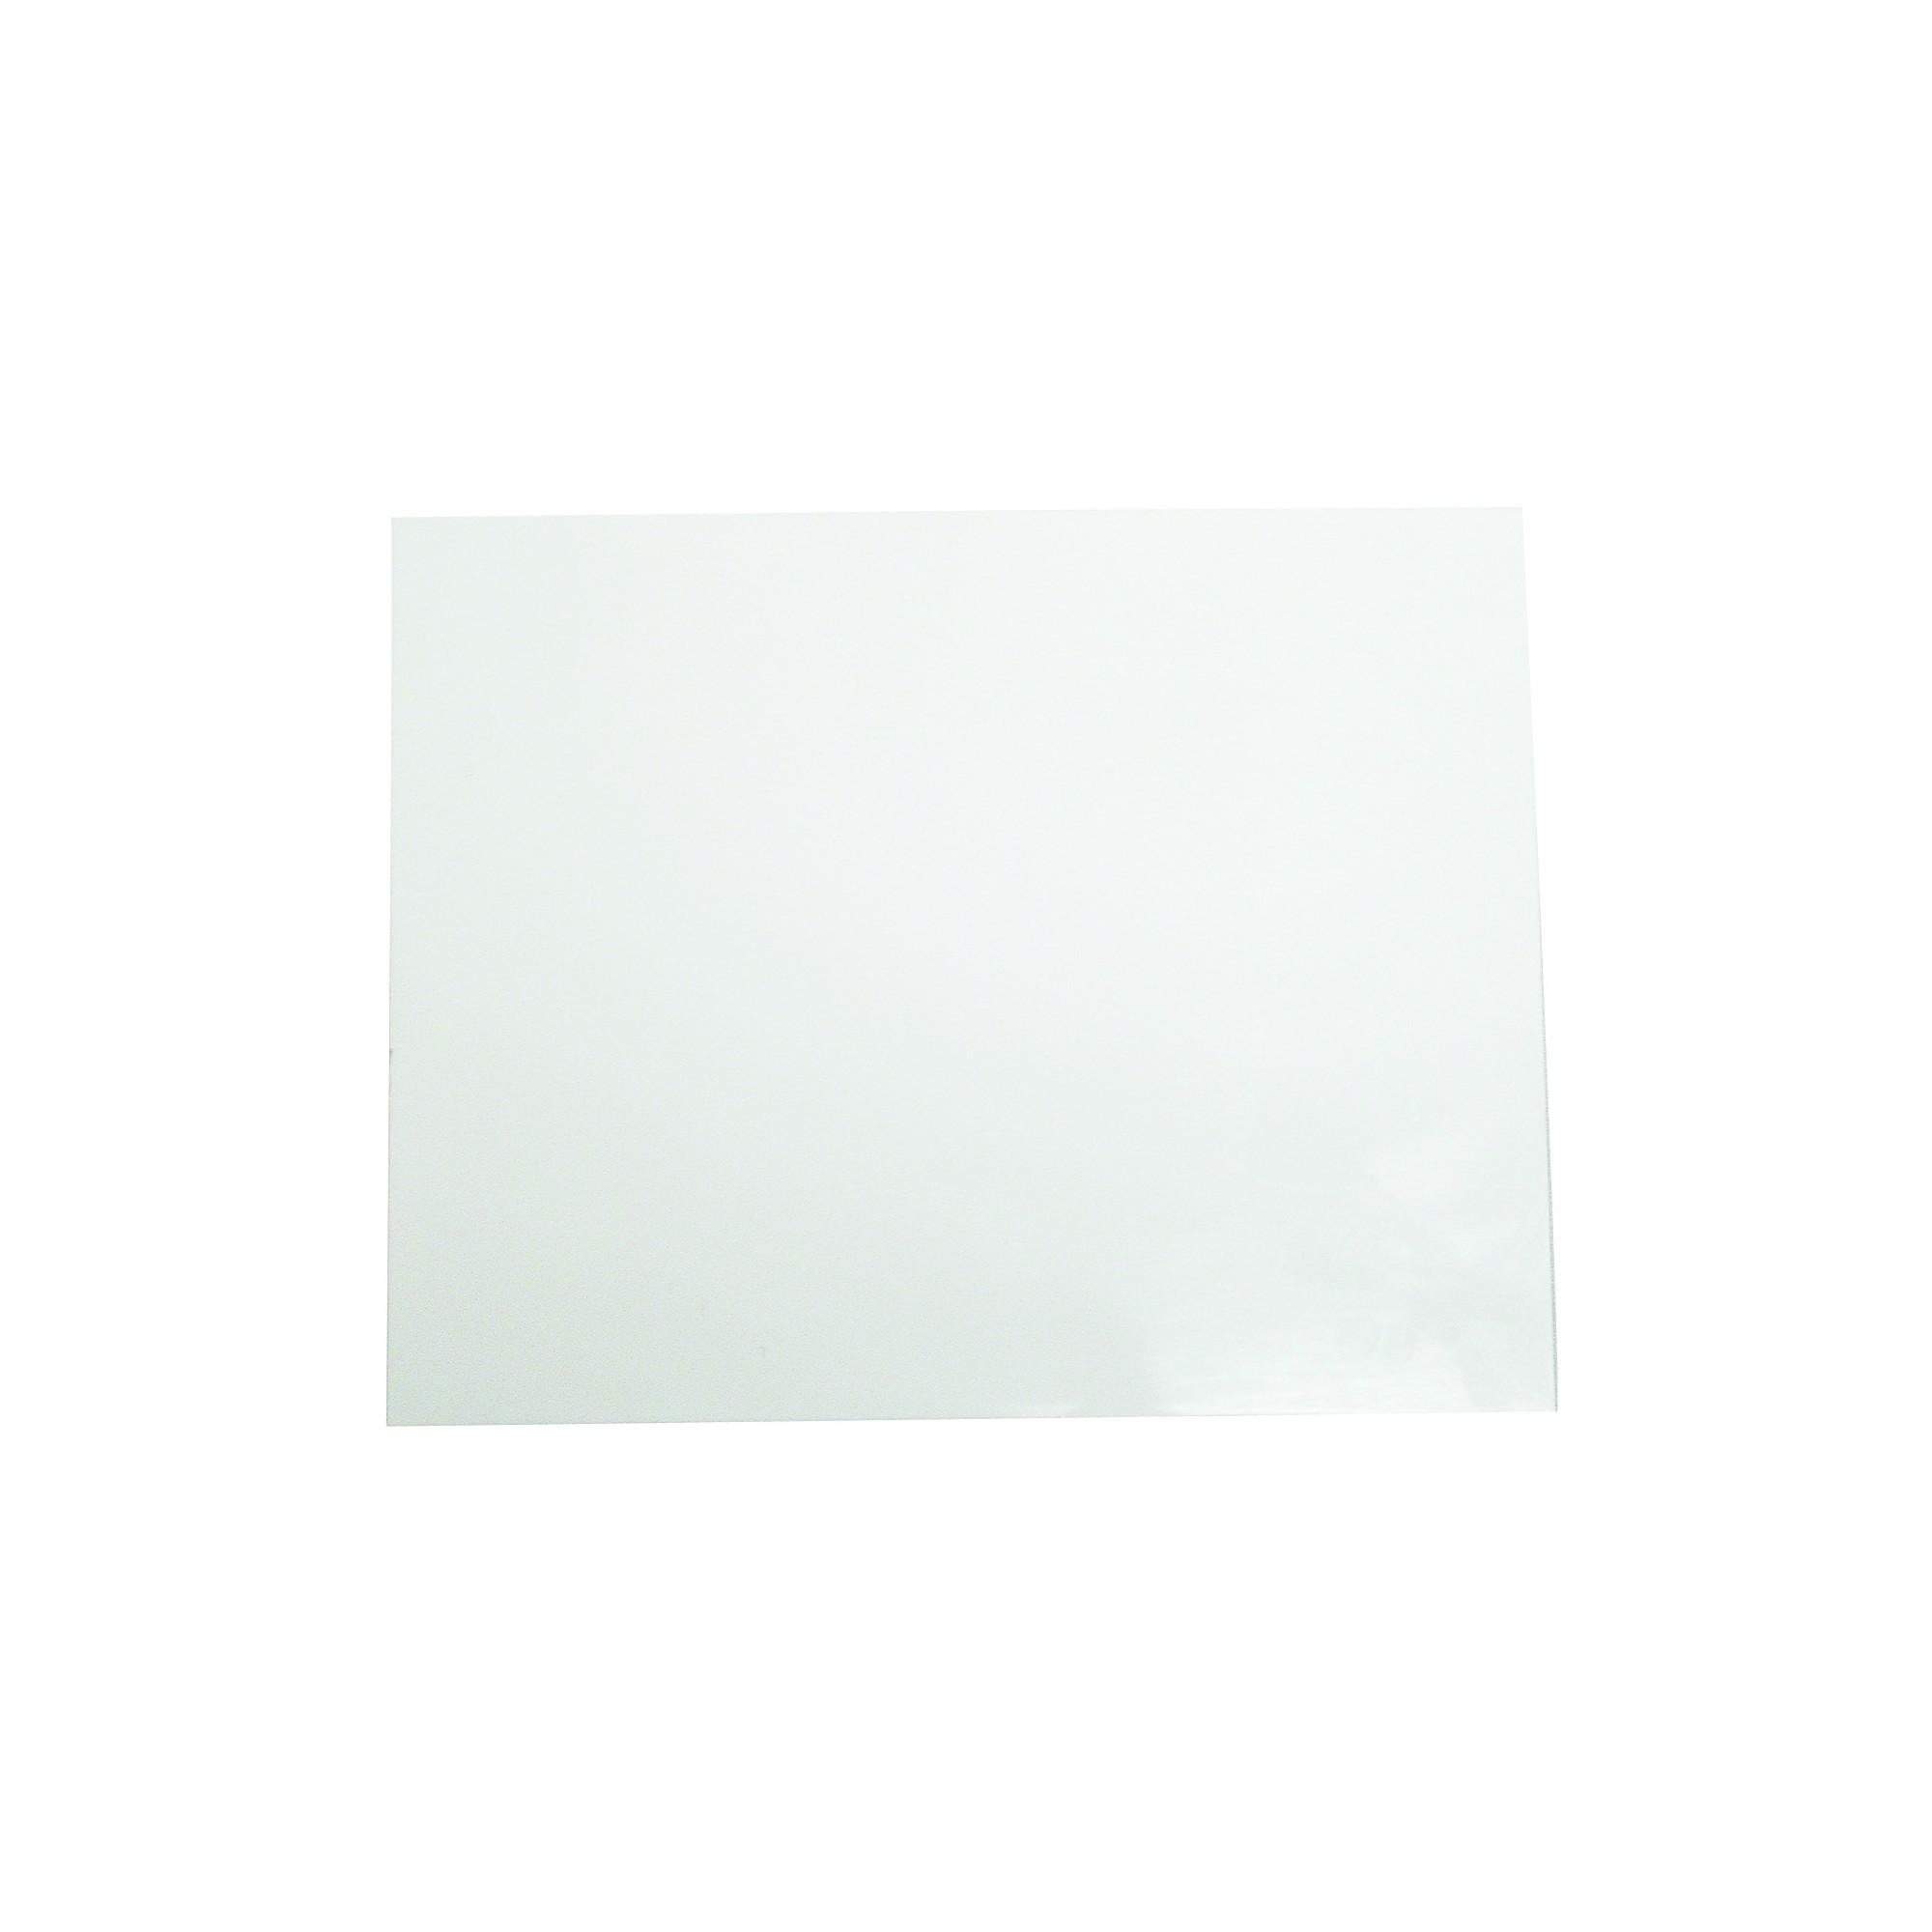 Plaque de travail rigide - 20x25cm